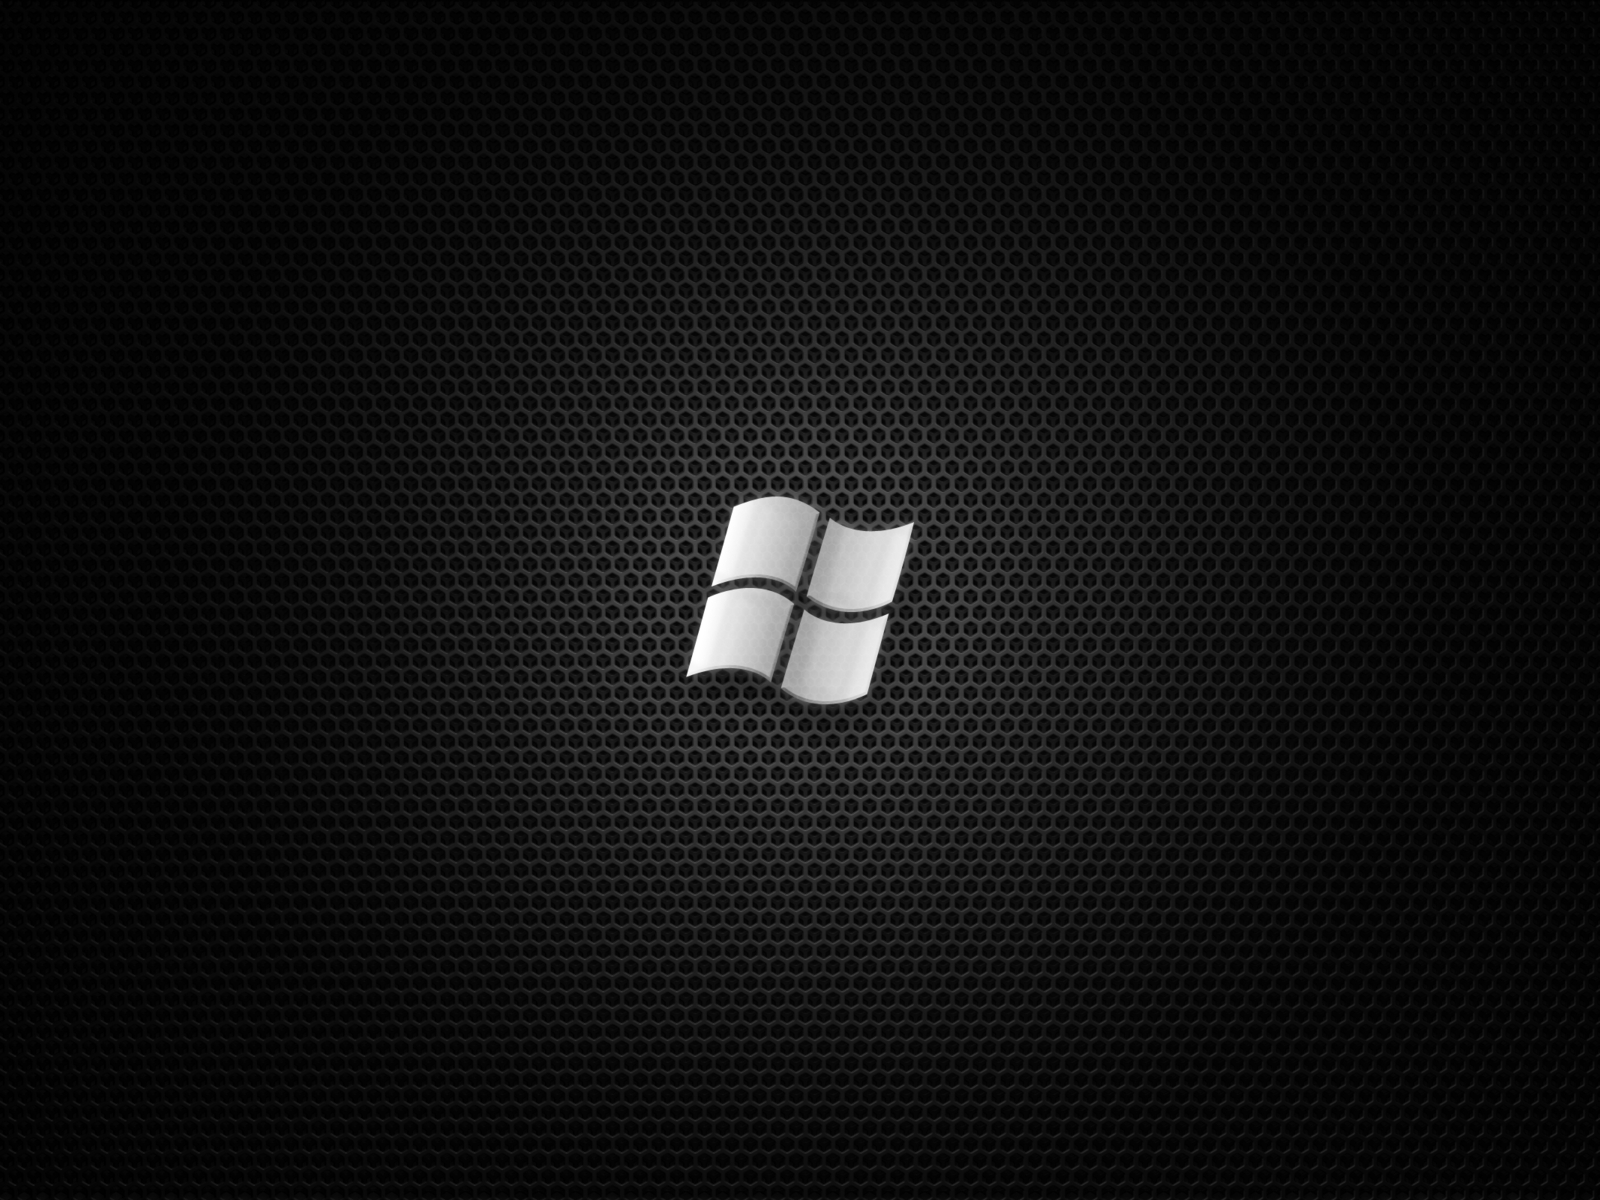 1600x1200 Windows 7 in purple desktop PC and Mac wallpaper